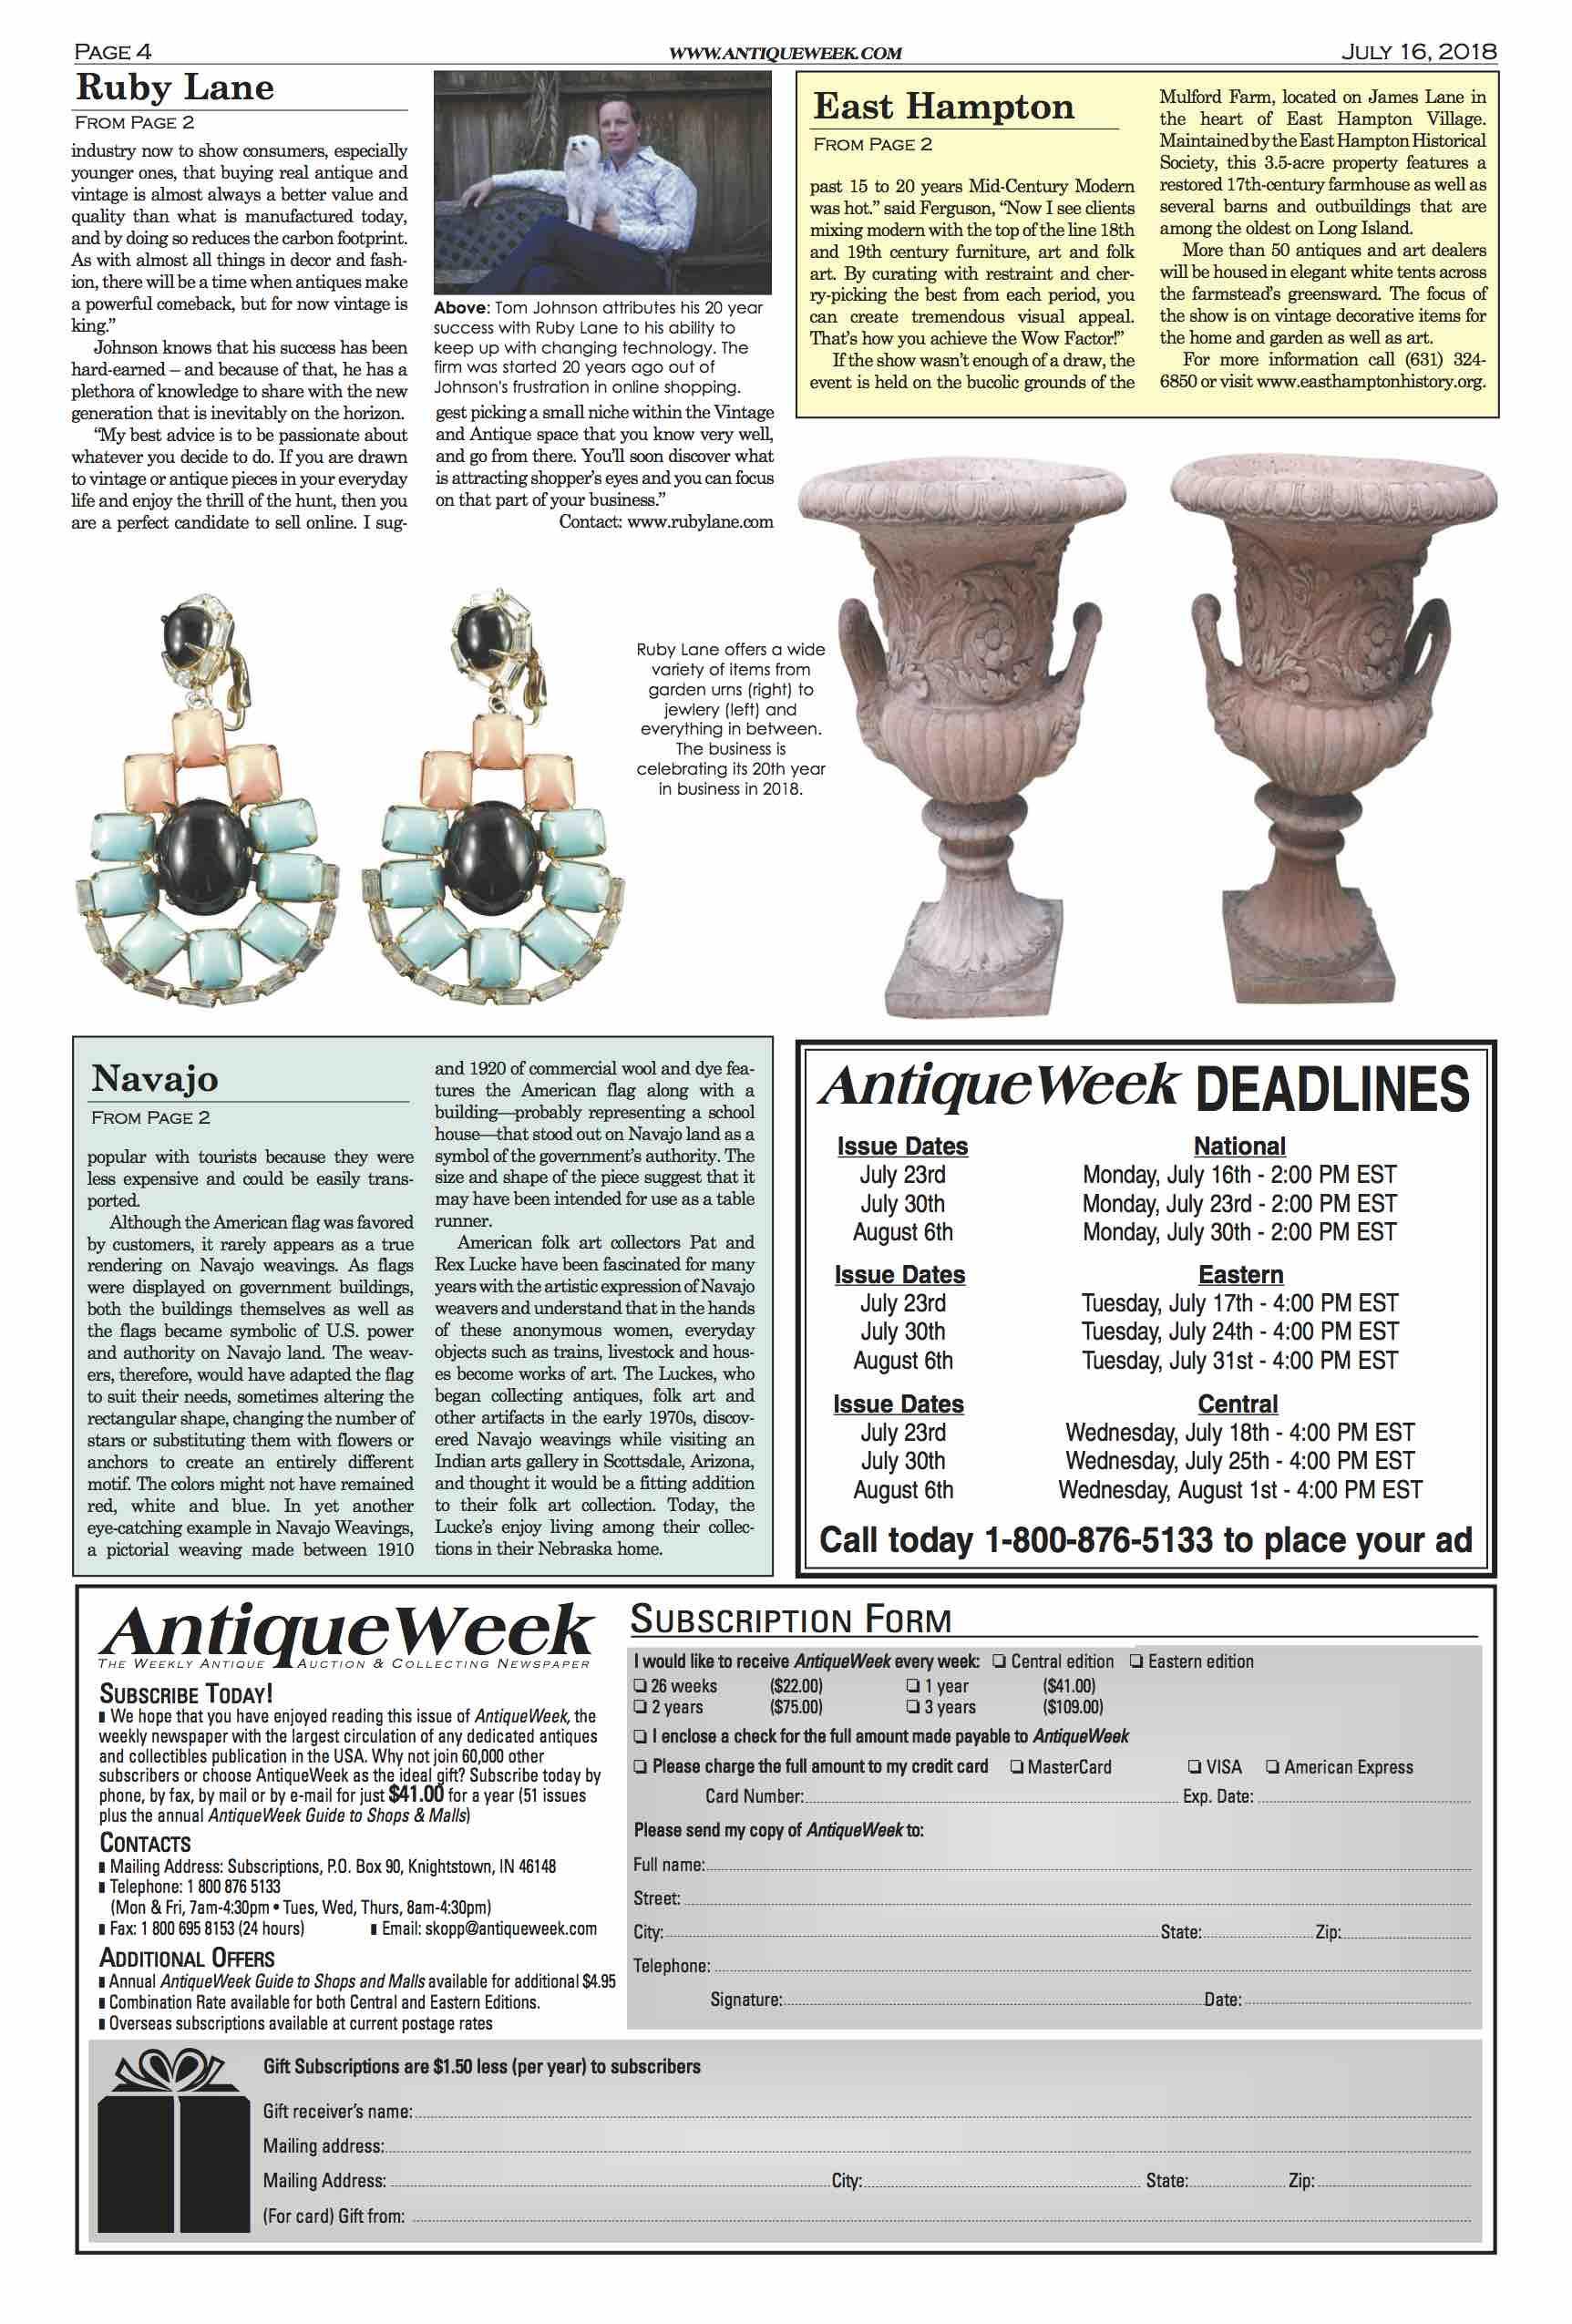 July 16, 2018, Antique Week, Ruby Lane Celebrates 20 Years image 2